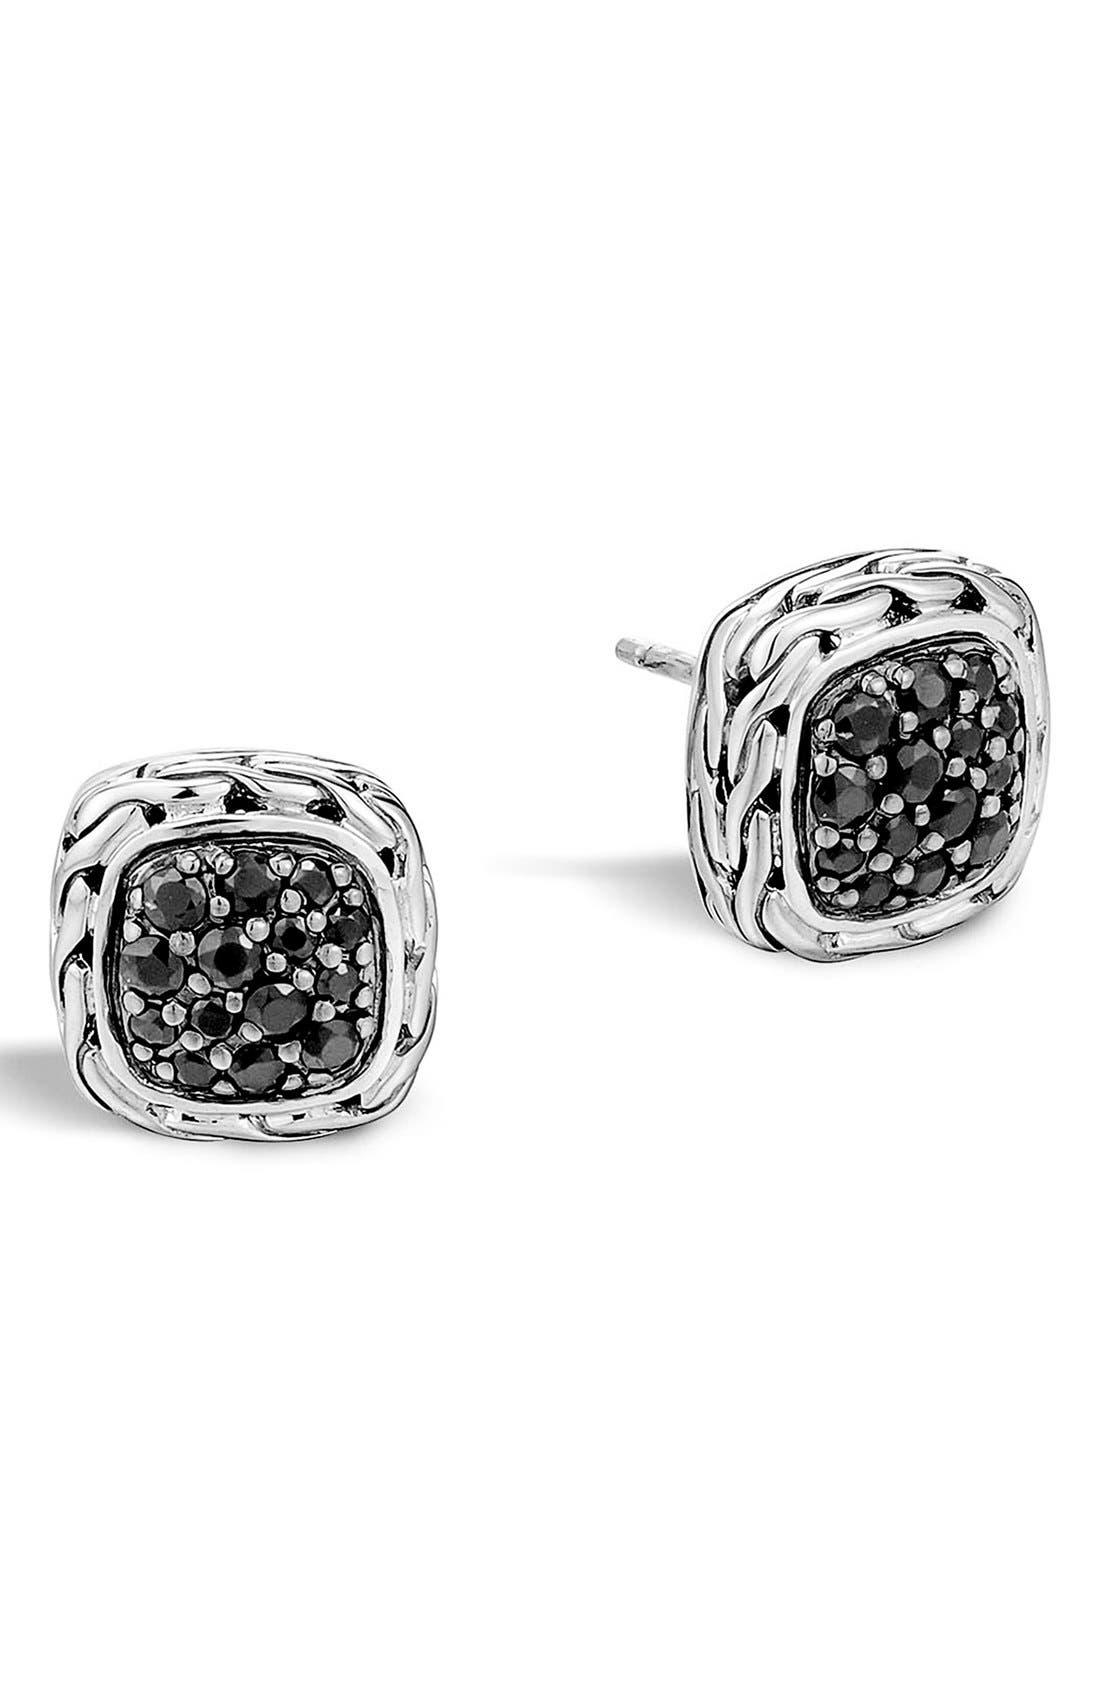 Main Image - John Hardy 'Classic Chain' Small Square Stud Earrings